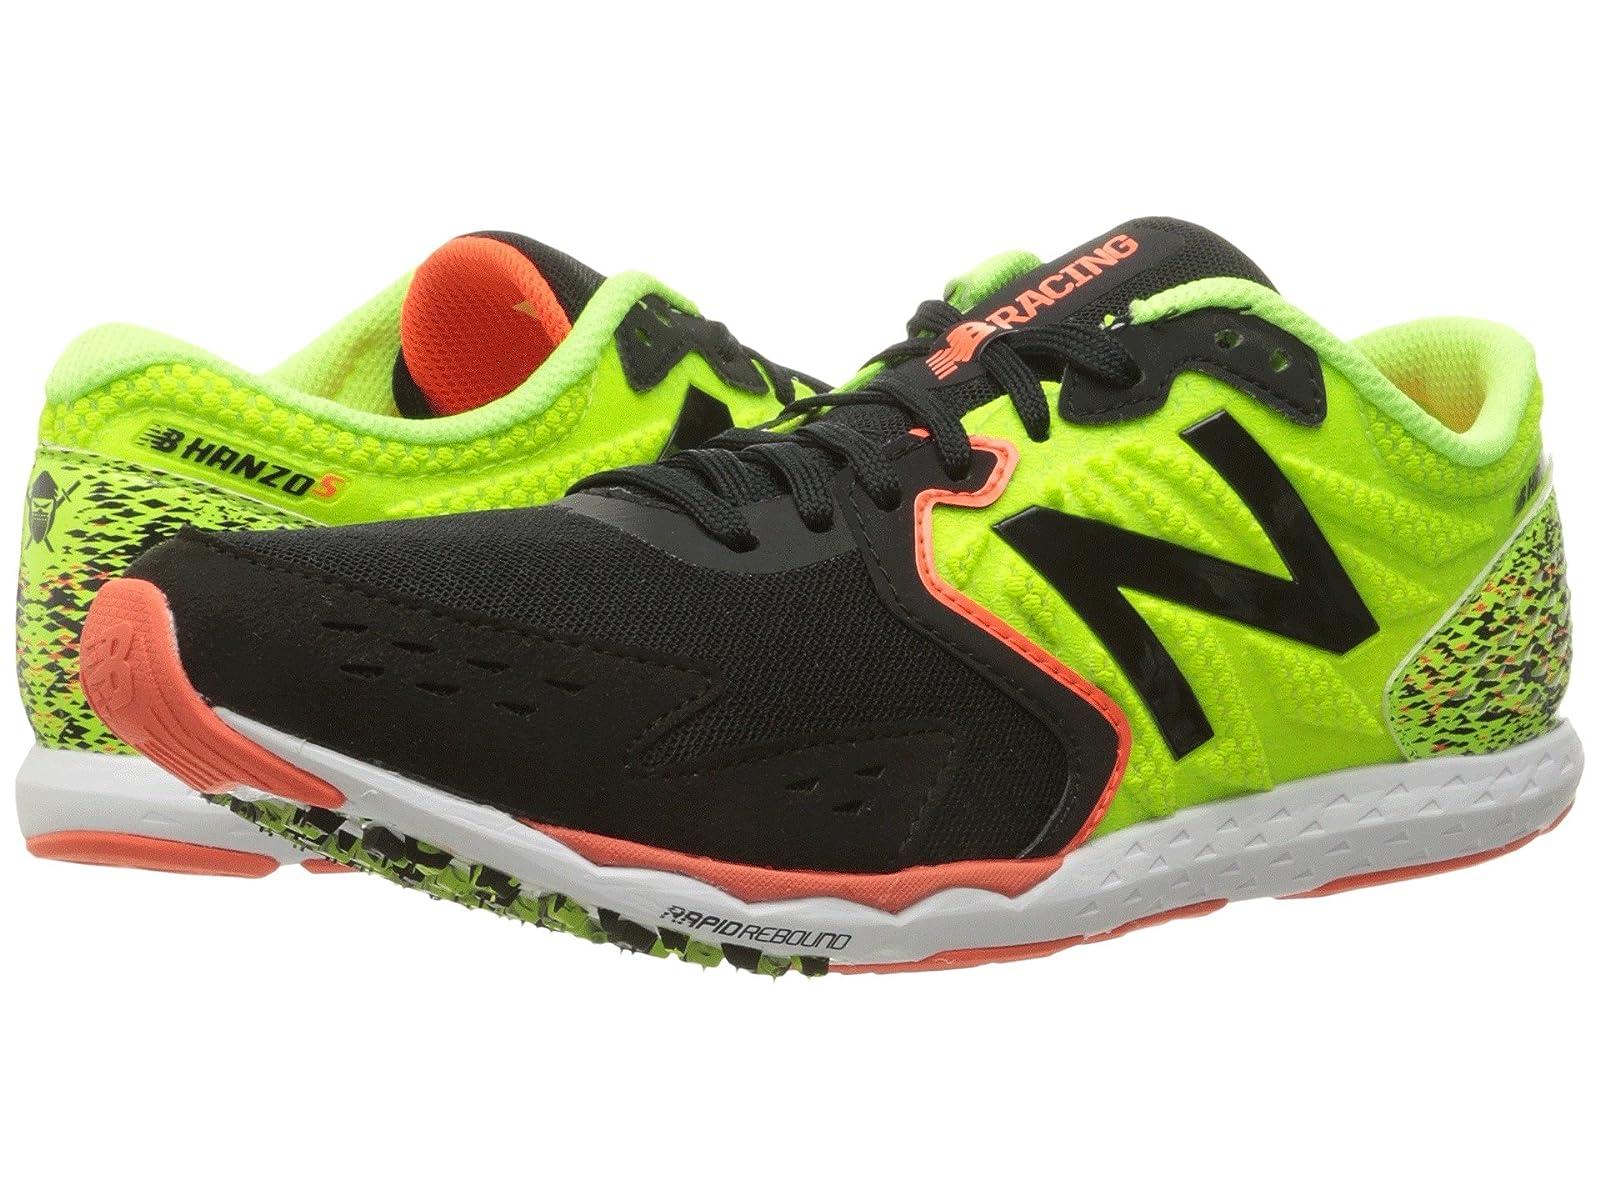 New Balance Hanzo SCheap and distinctive eye-catching shoes